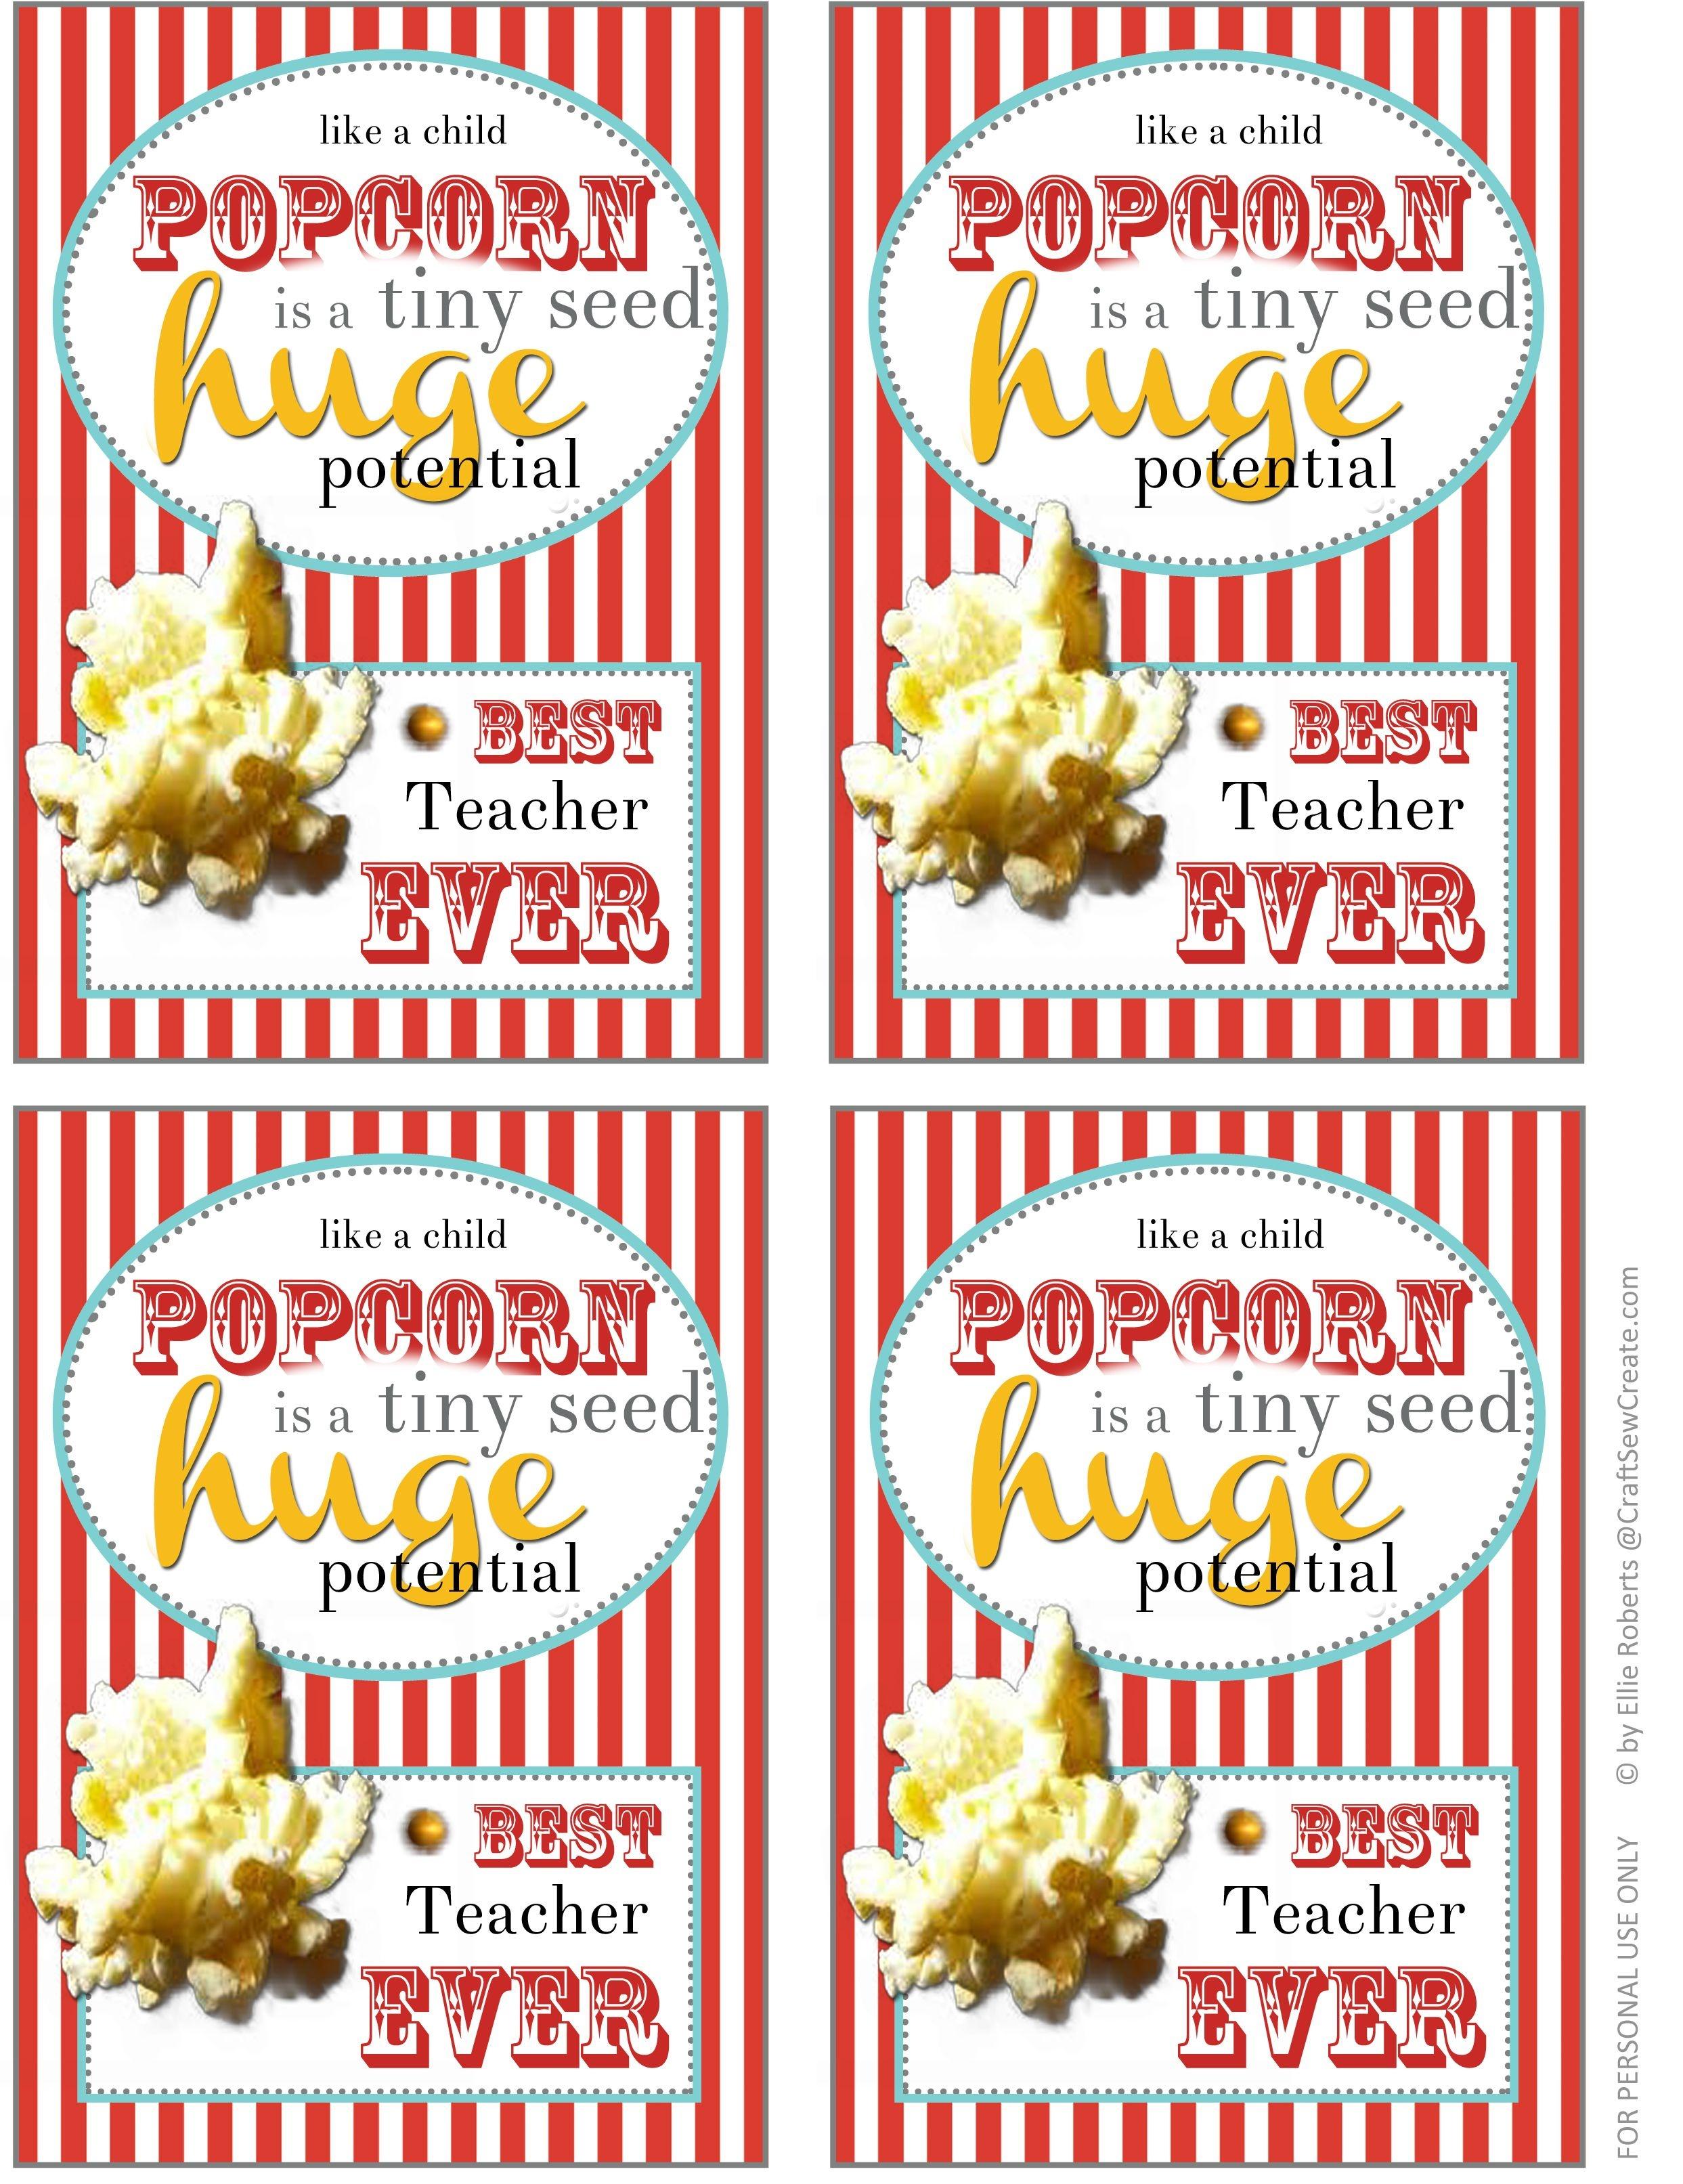 Thank You For Popcorn Printable For Primary Teachers | Primary - Free Popcorn Teacher Appreciation Printable